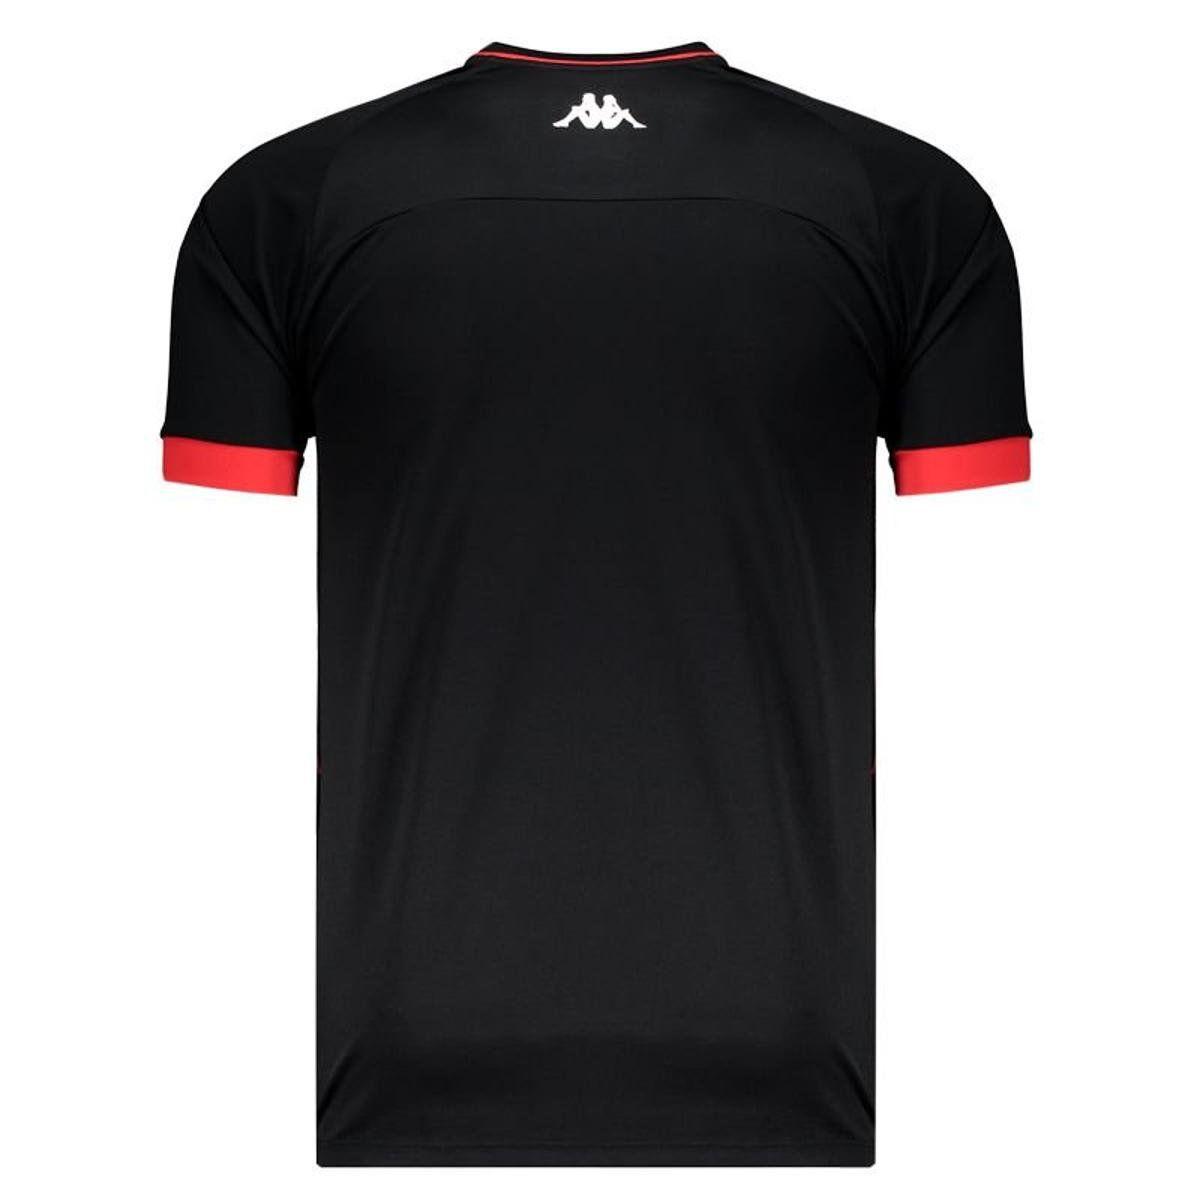 Camisa Goleiro Jogo II - Kappa - 2019 - Masculina - Preto